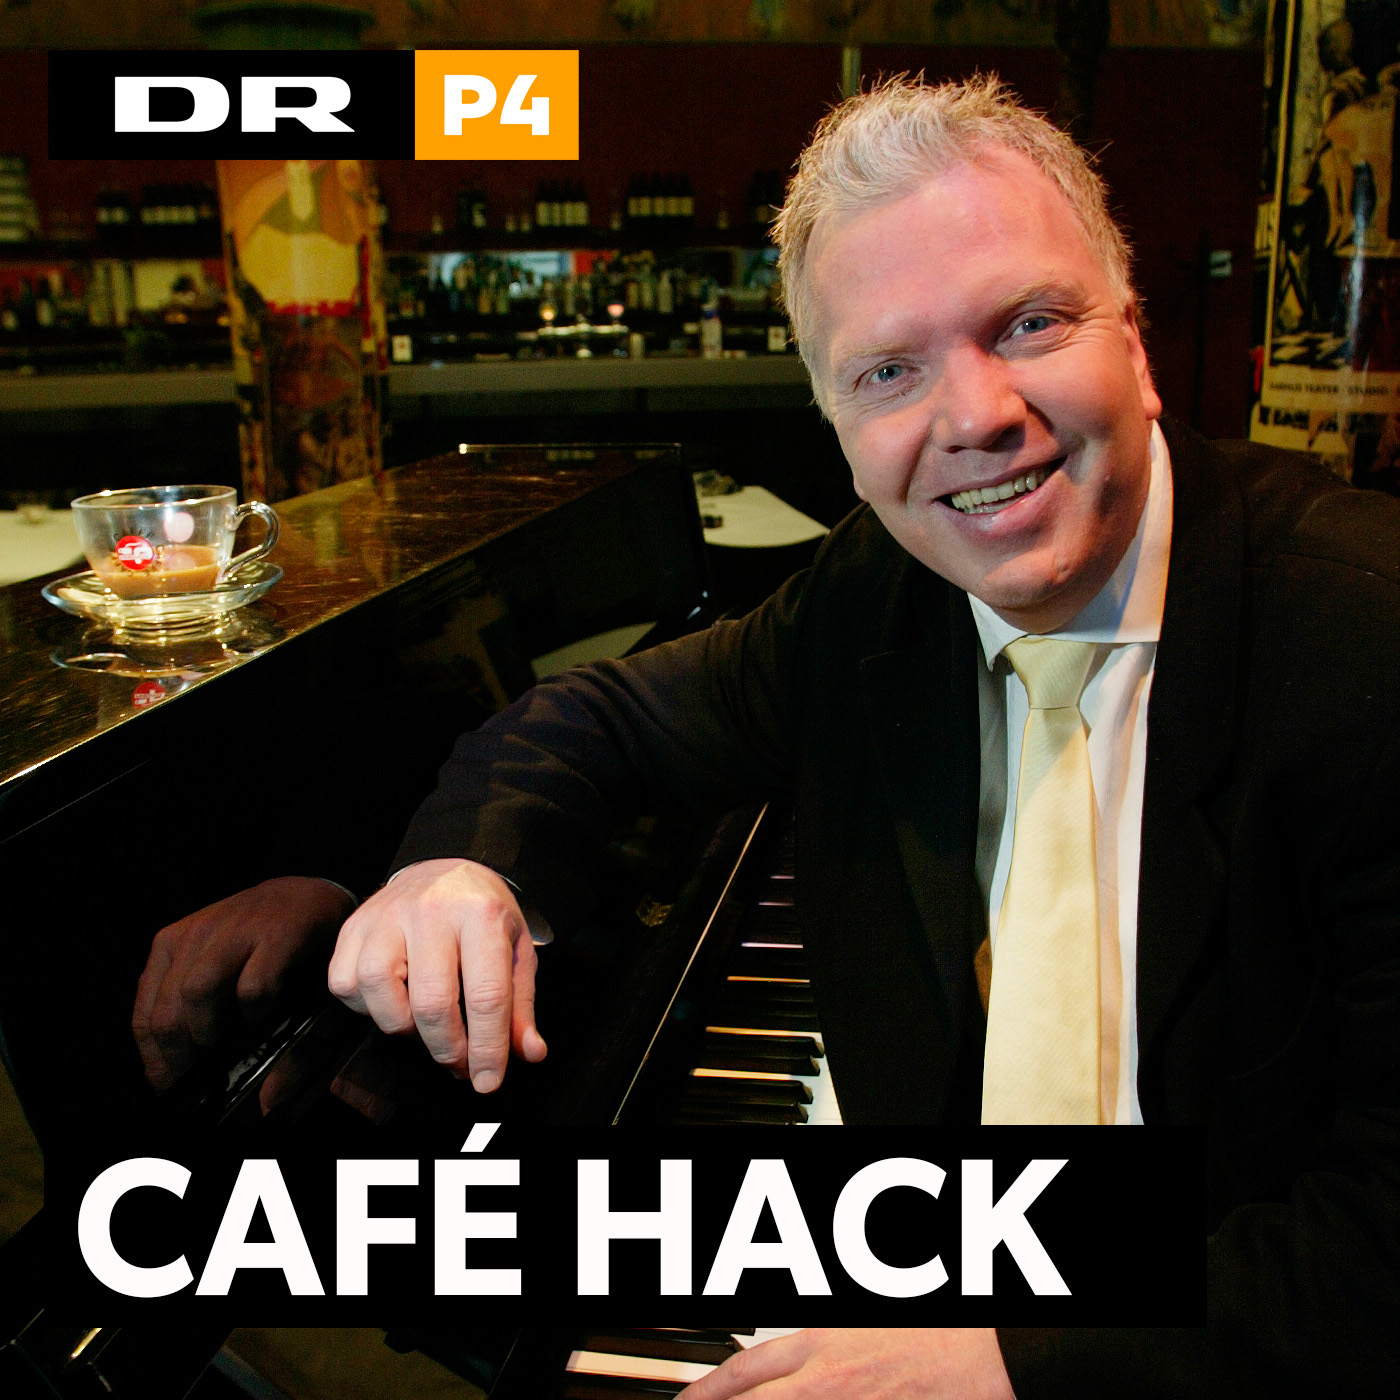 Café Hack